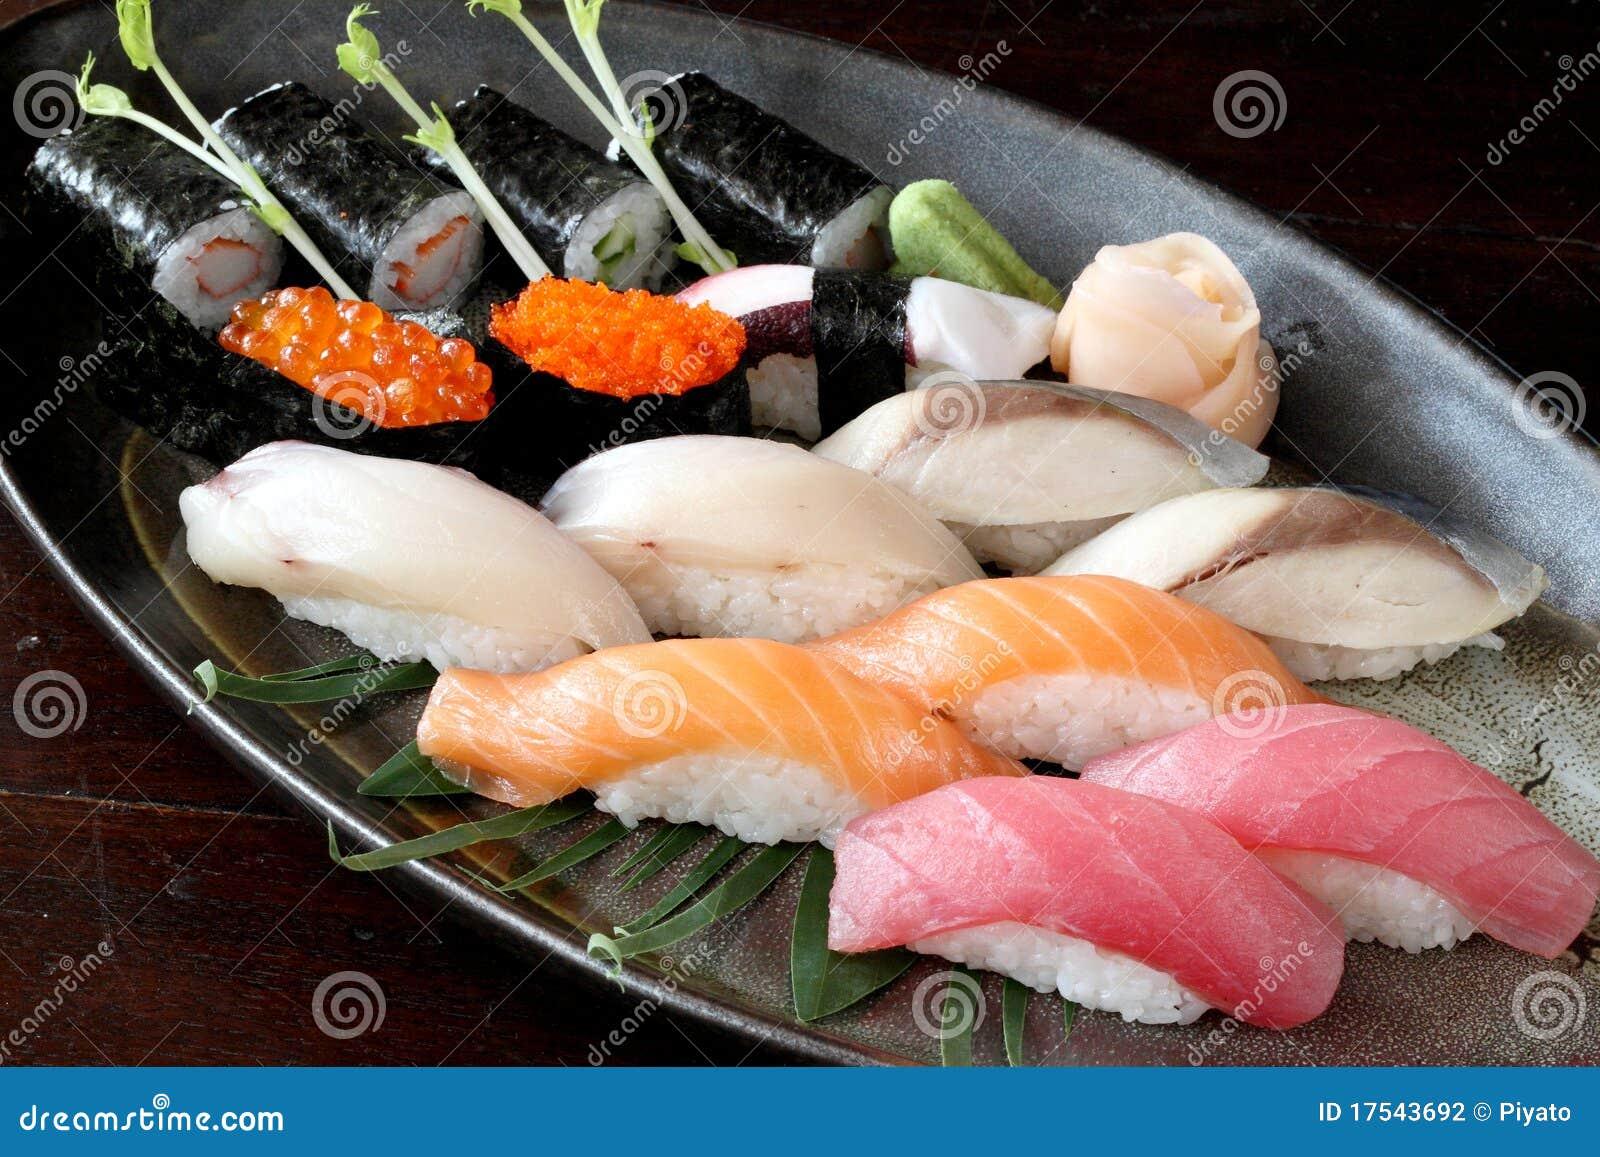 Japanese food raw salmon tuna saba sushi stock photography for Is sushi raw fish